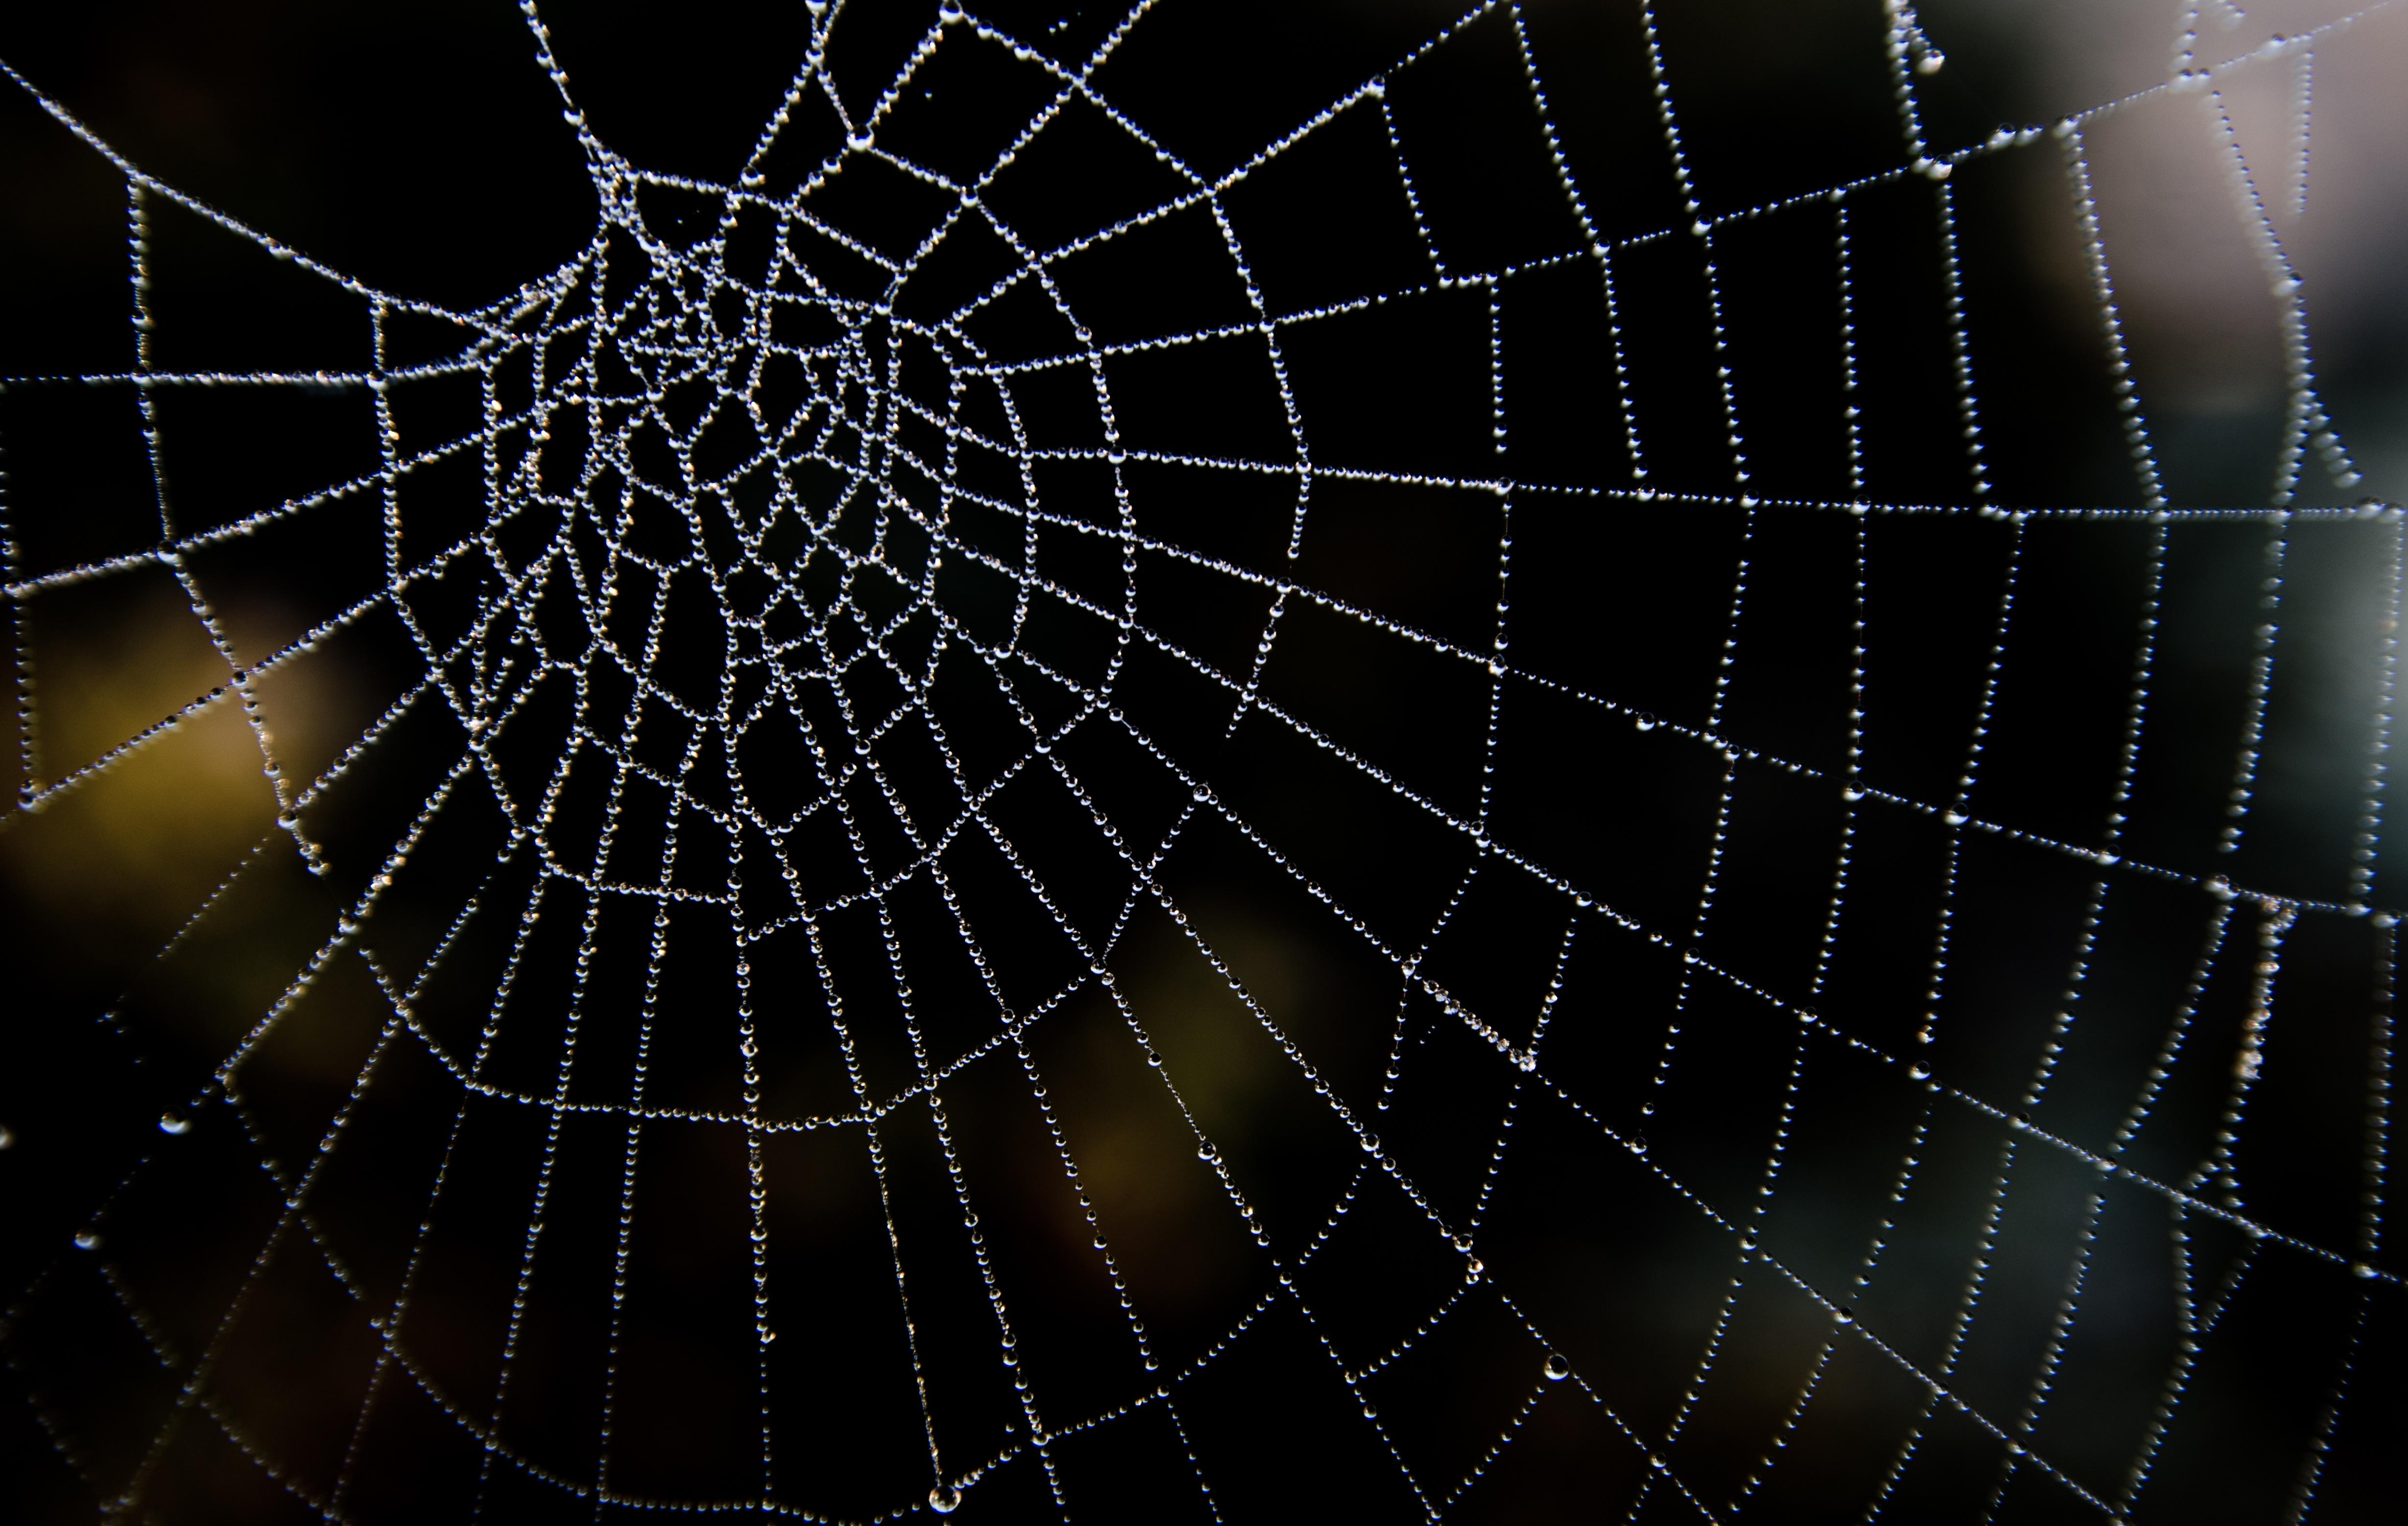 Spider Web Background Images TheCelebrityPix 4918x3117